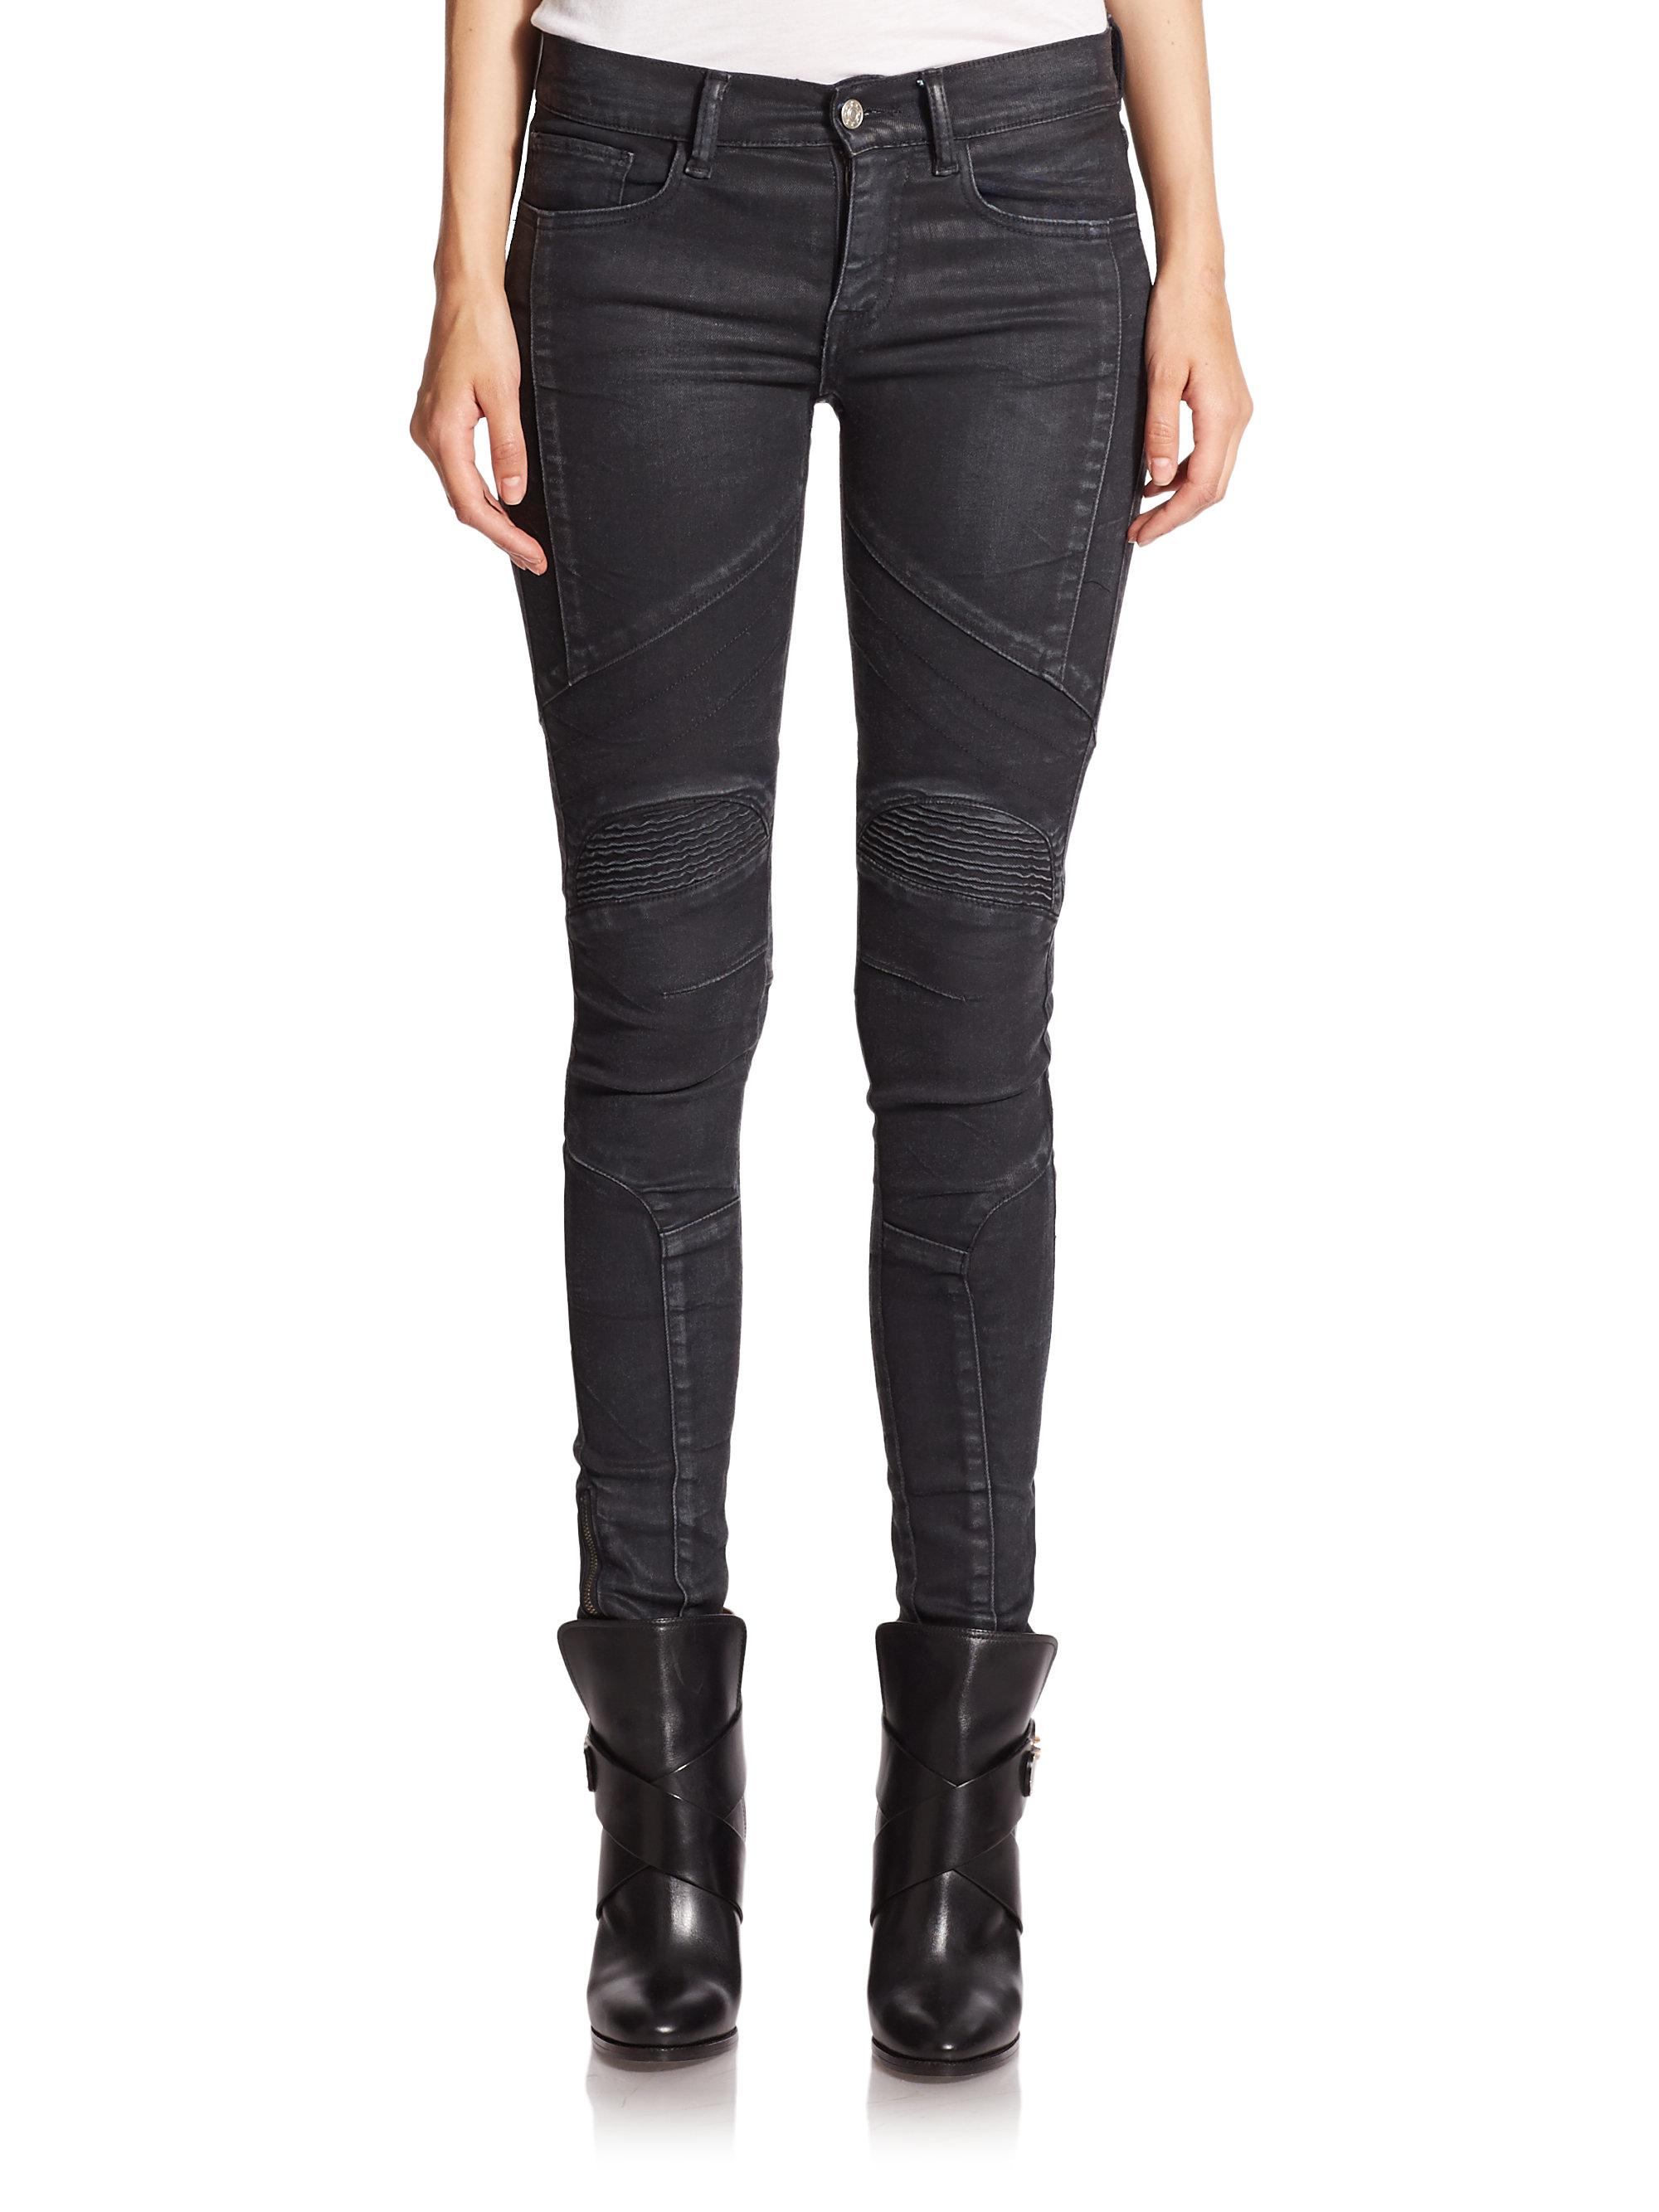 Amazing Cheap Ralph Lauren Pants For Women 34966 24 USD GT034966